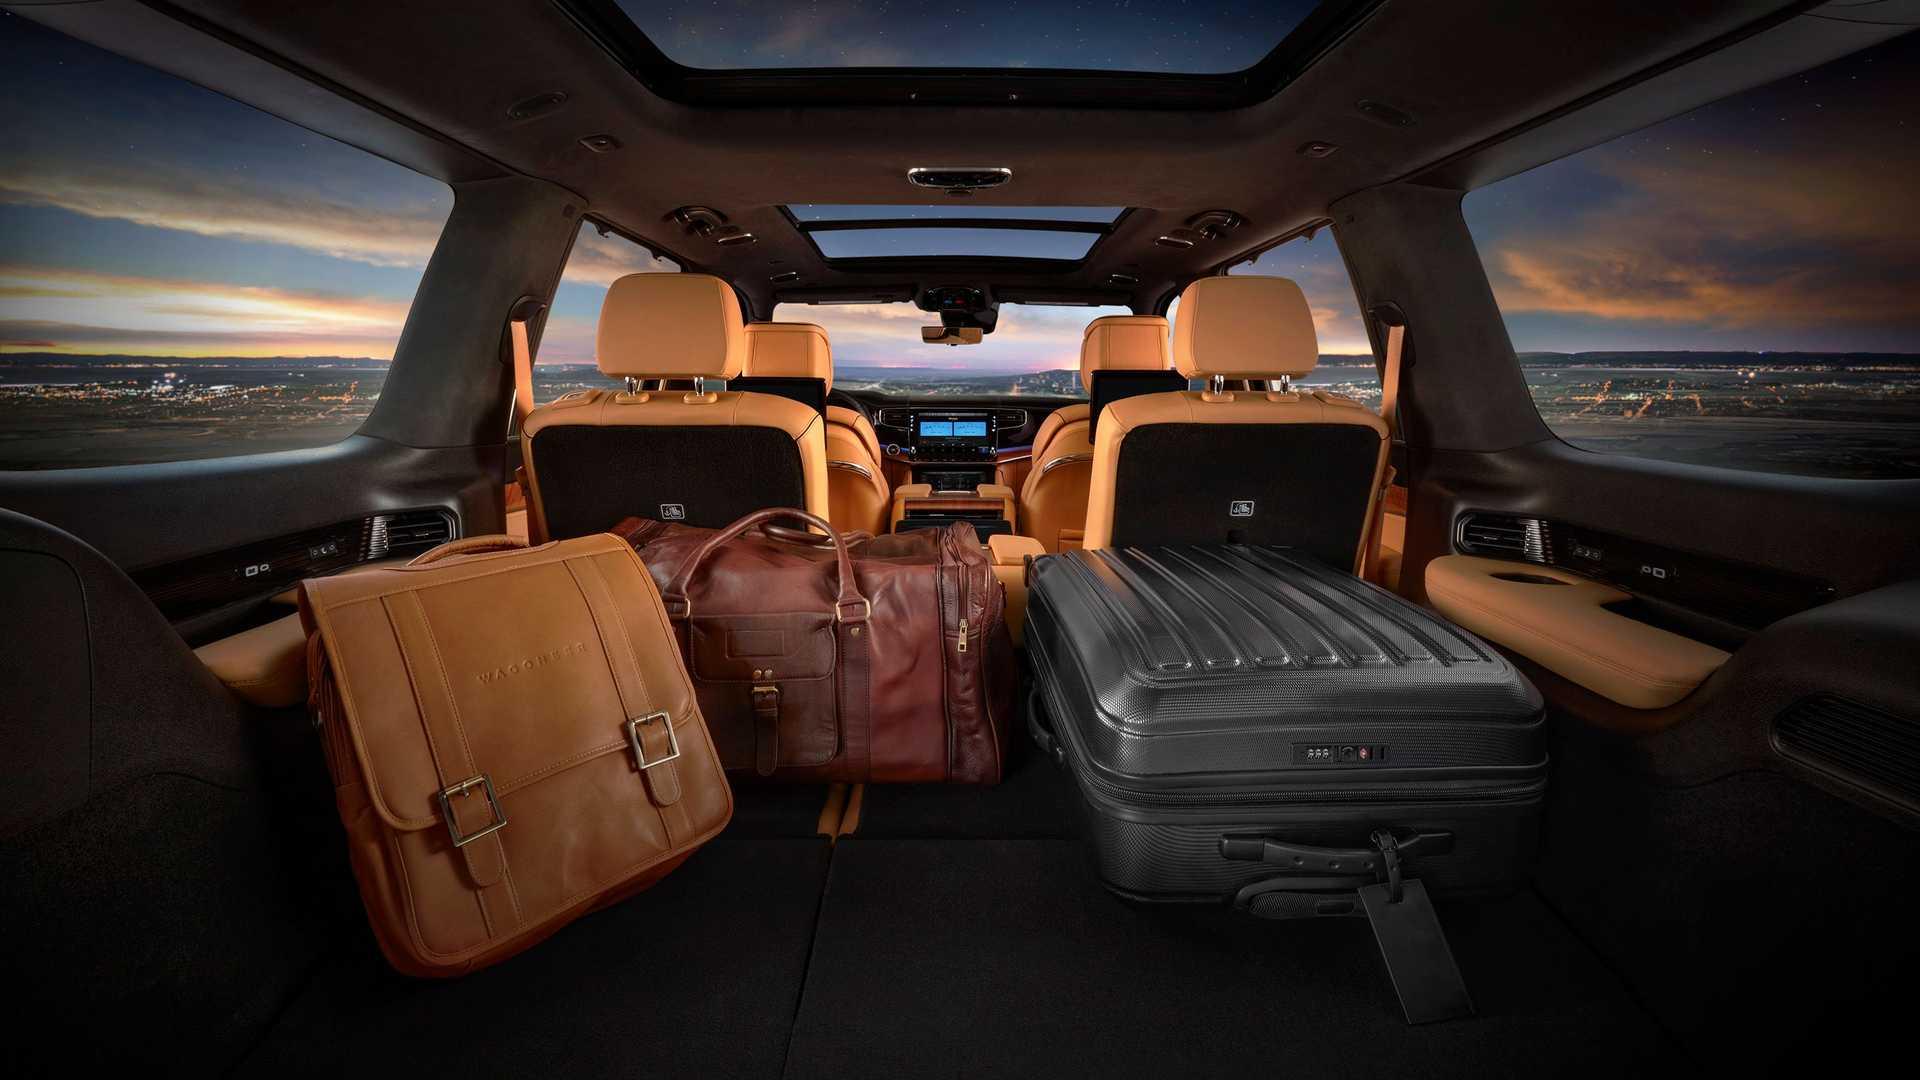 2022-jeep-grand-wagoneer-interior-cargo-space